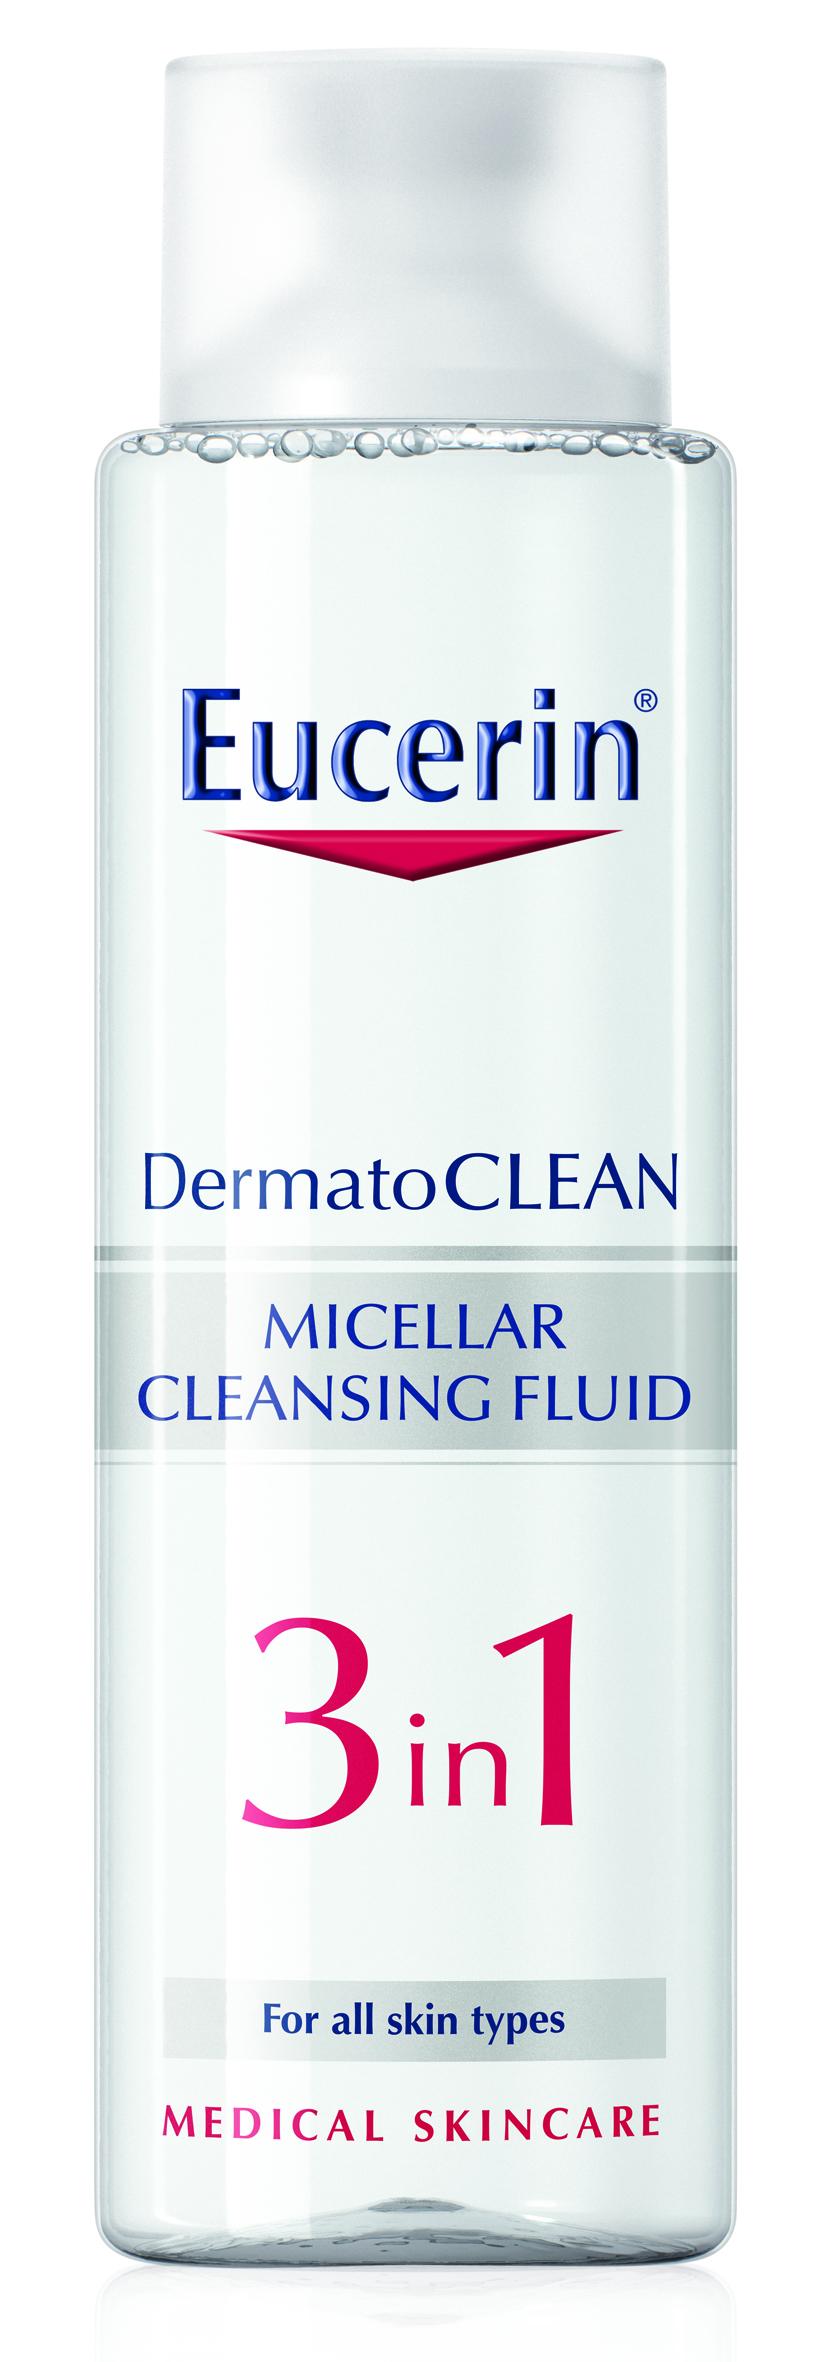 ECN 16822 69754 DermatoClean Micellar Cleansing Fluid 400ml PS Jesenja nega je nezamisliva bez OVIH beauty proizvoda